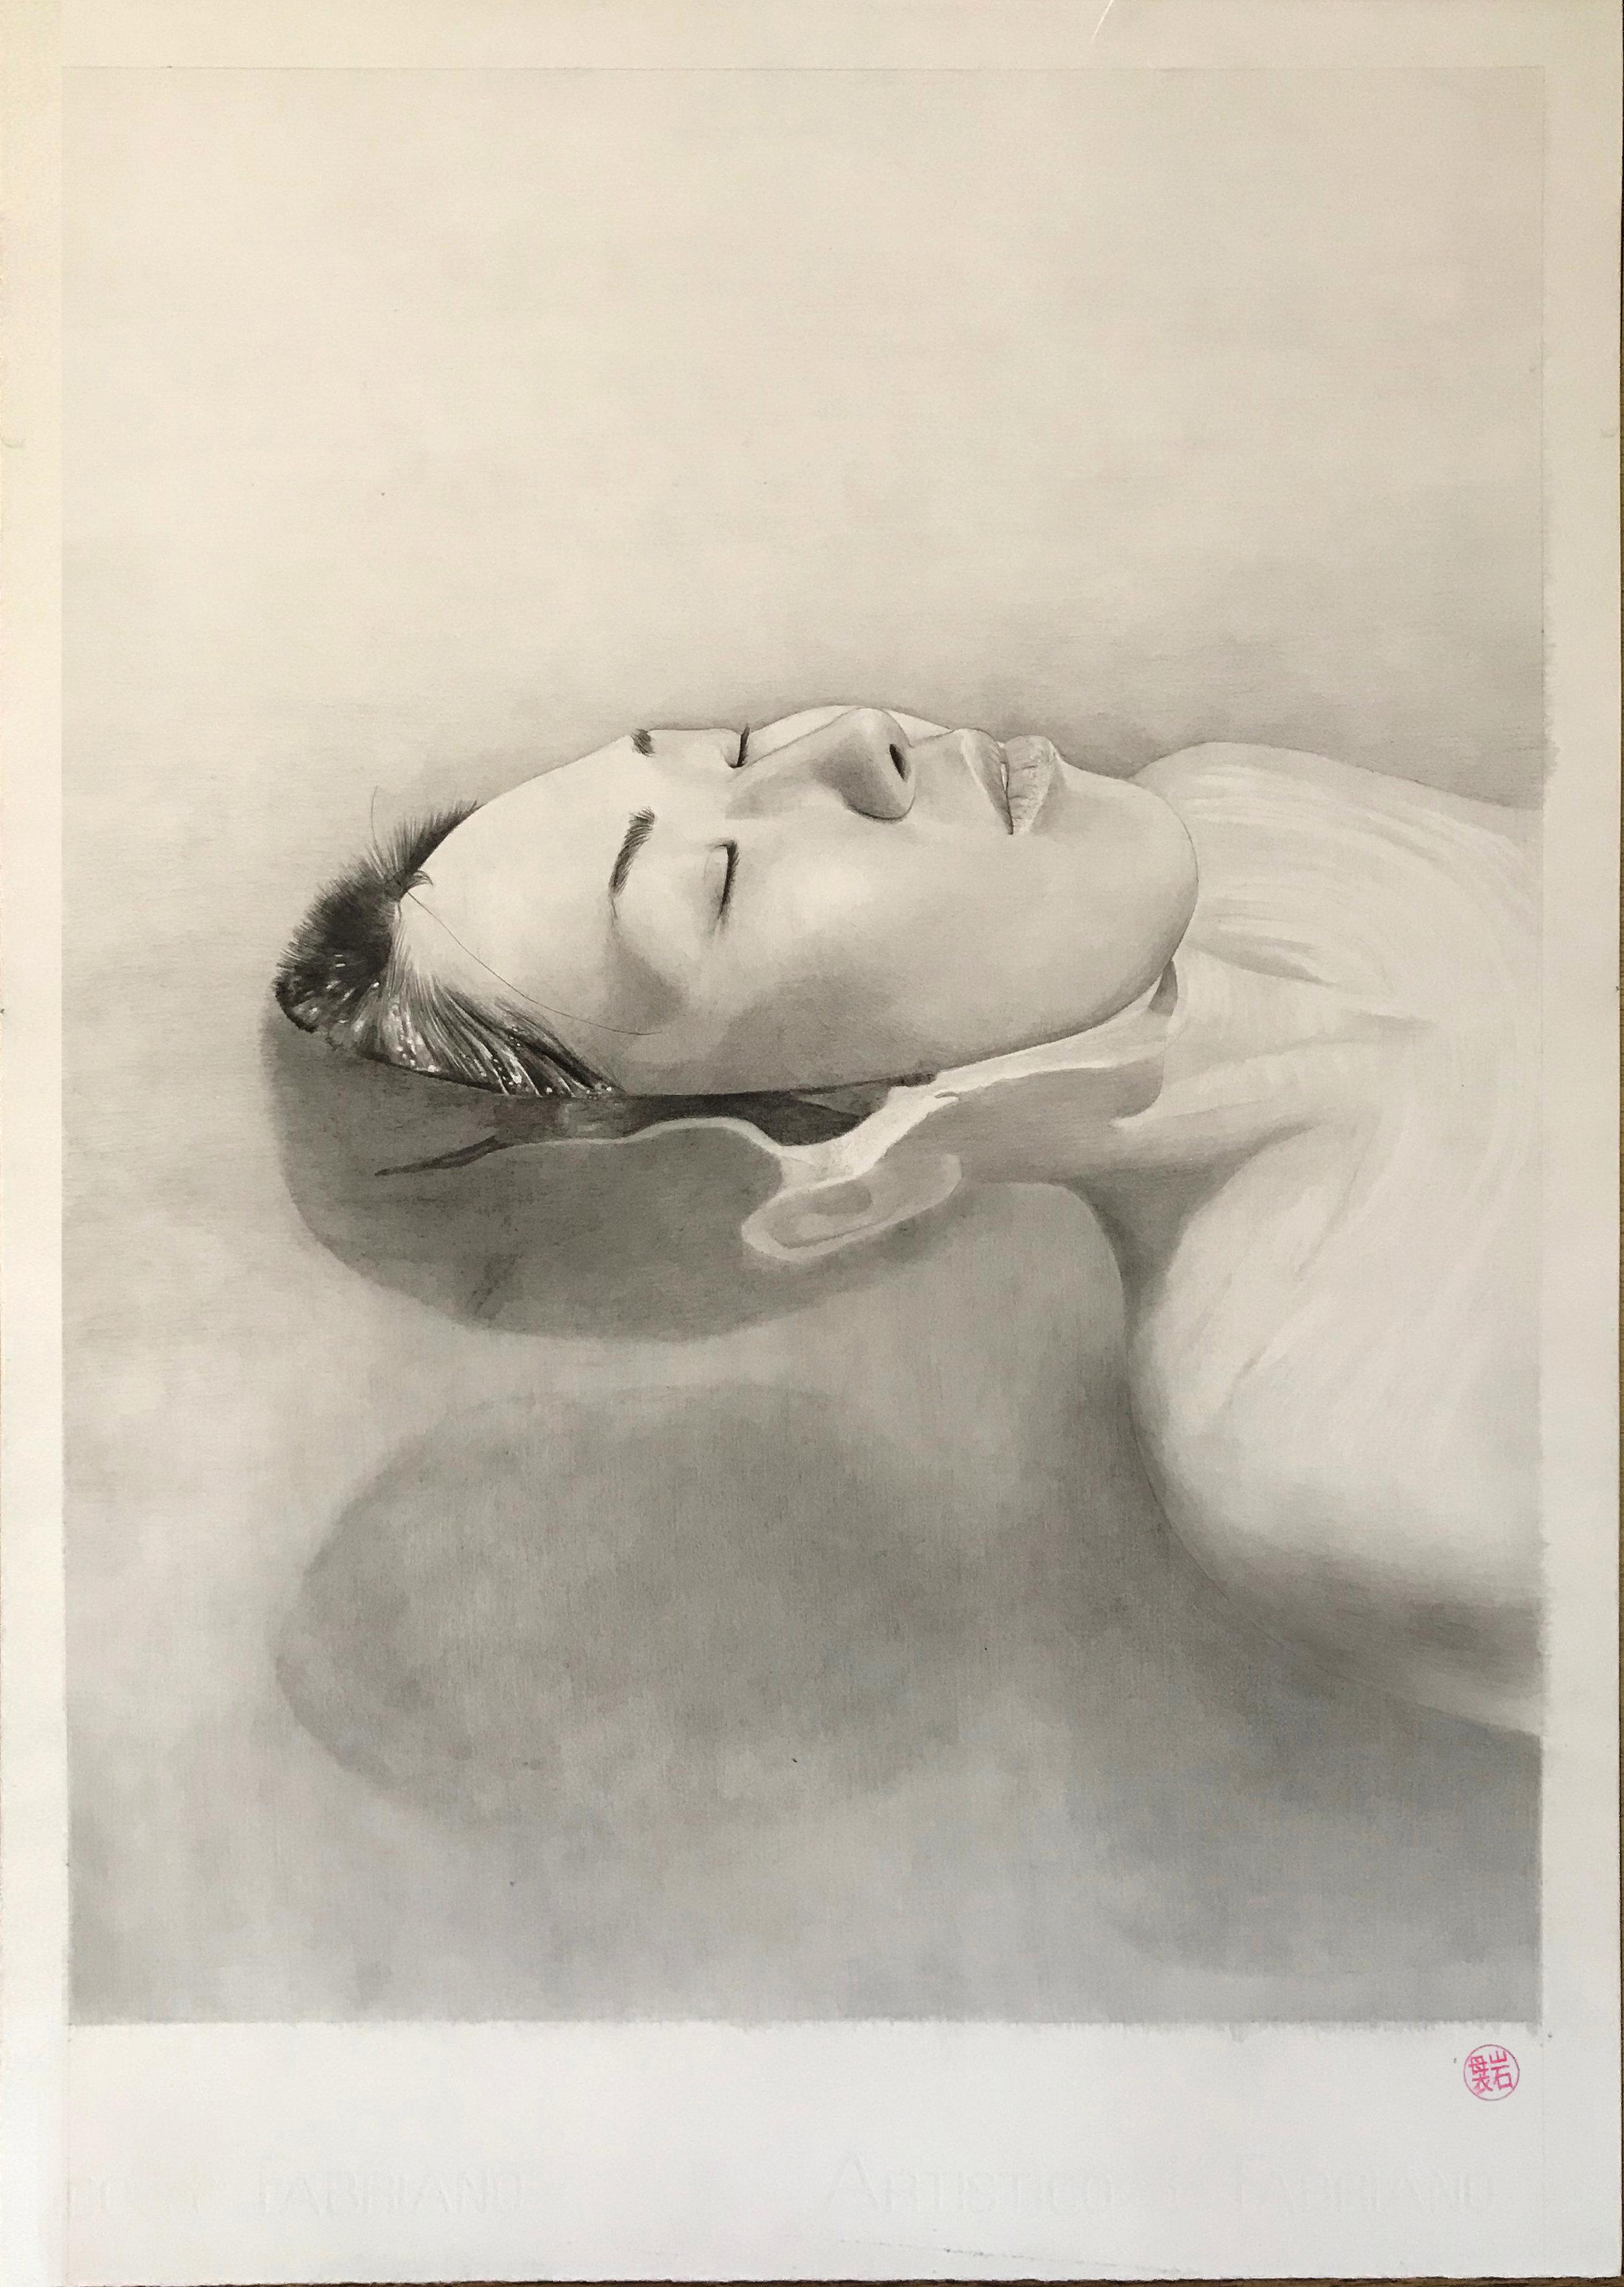 Study 04, Phantom Pain by Dante Horoiwa